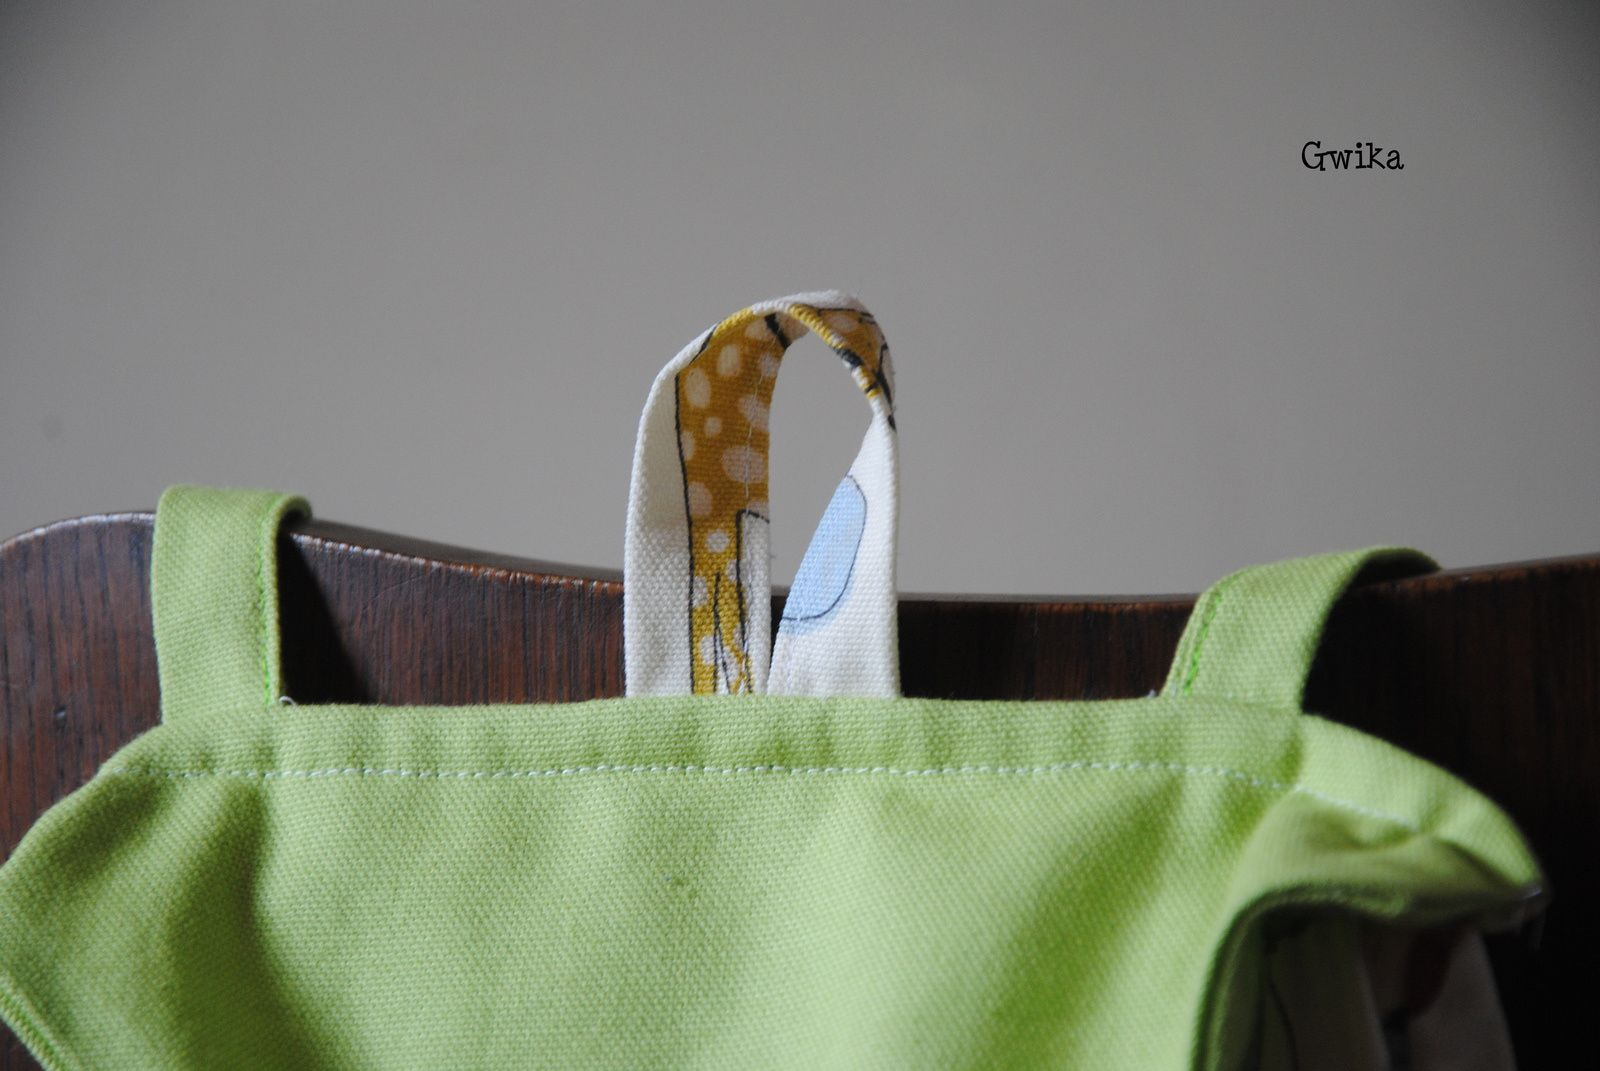 Un petit sac pour mon lutin.